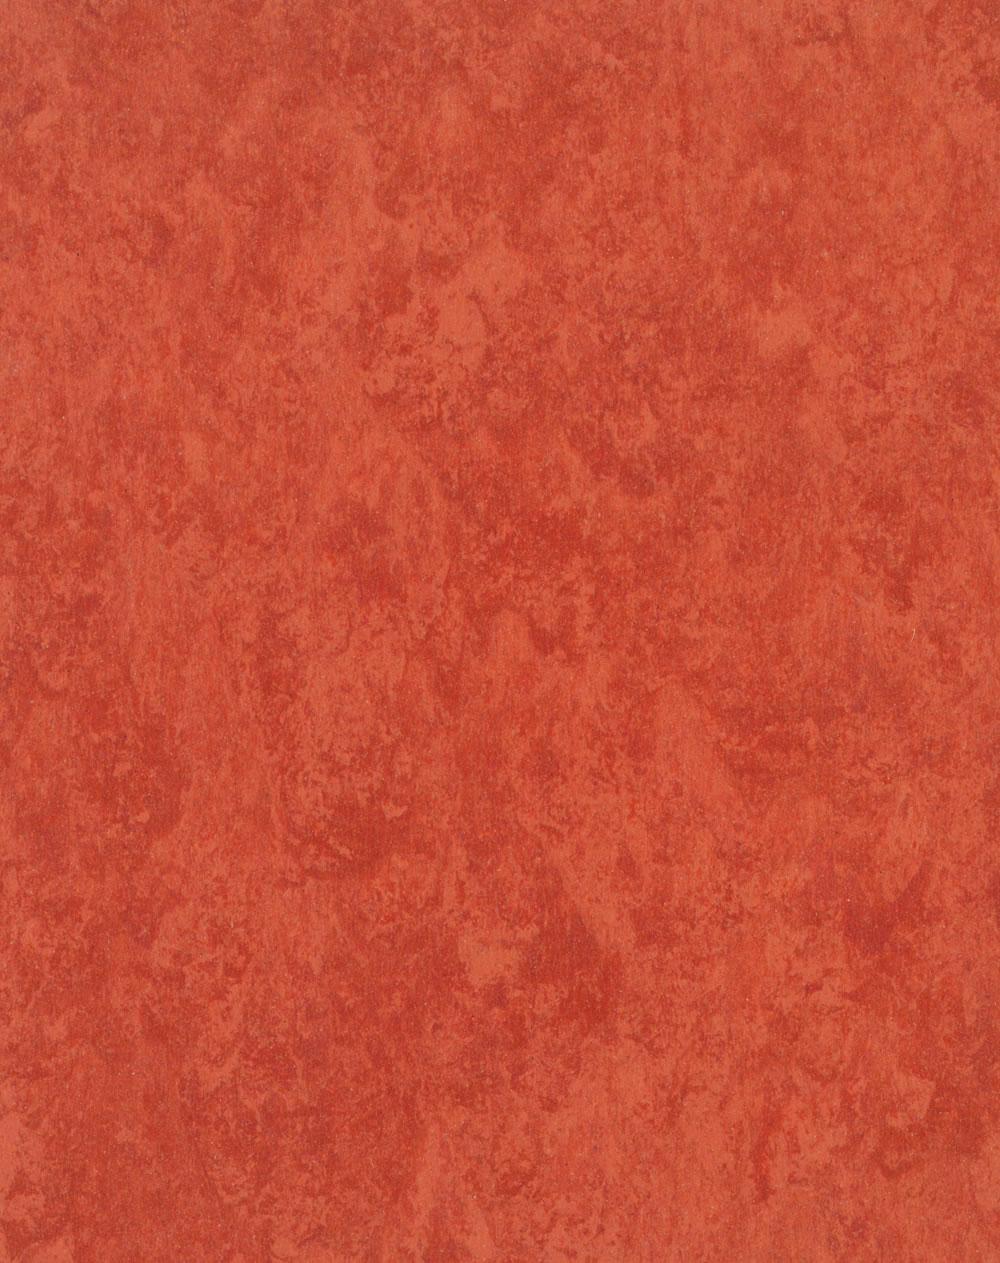 Terracotta Linoleum Vinyl Floors By Square Foot